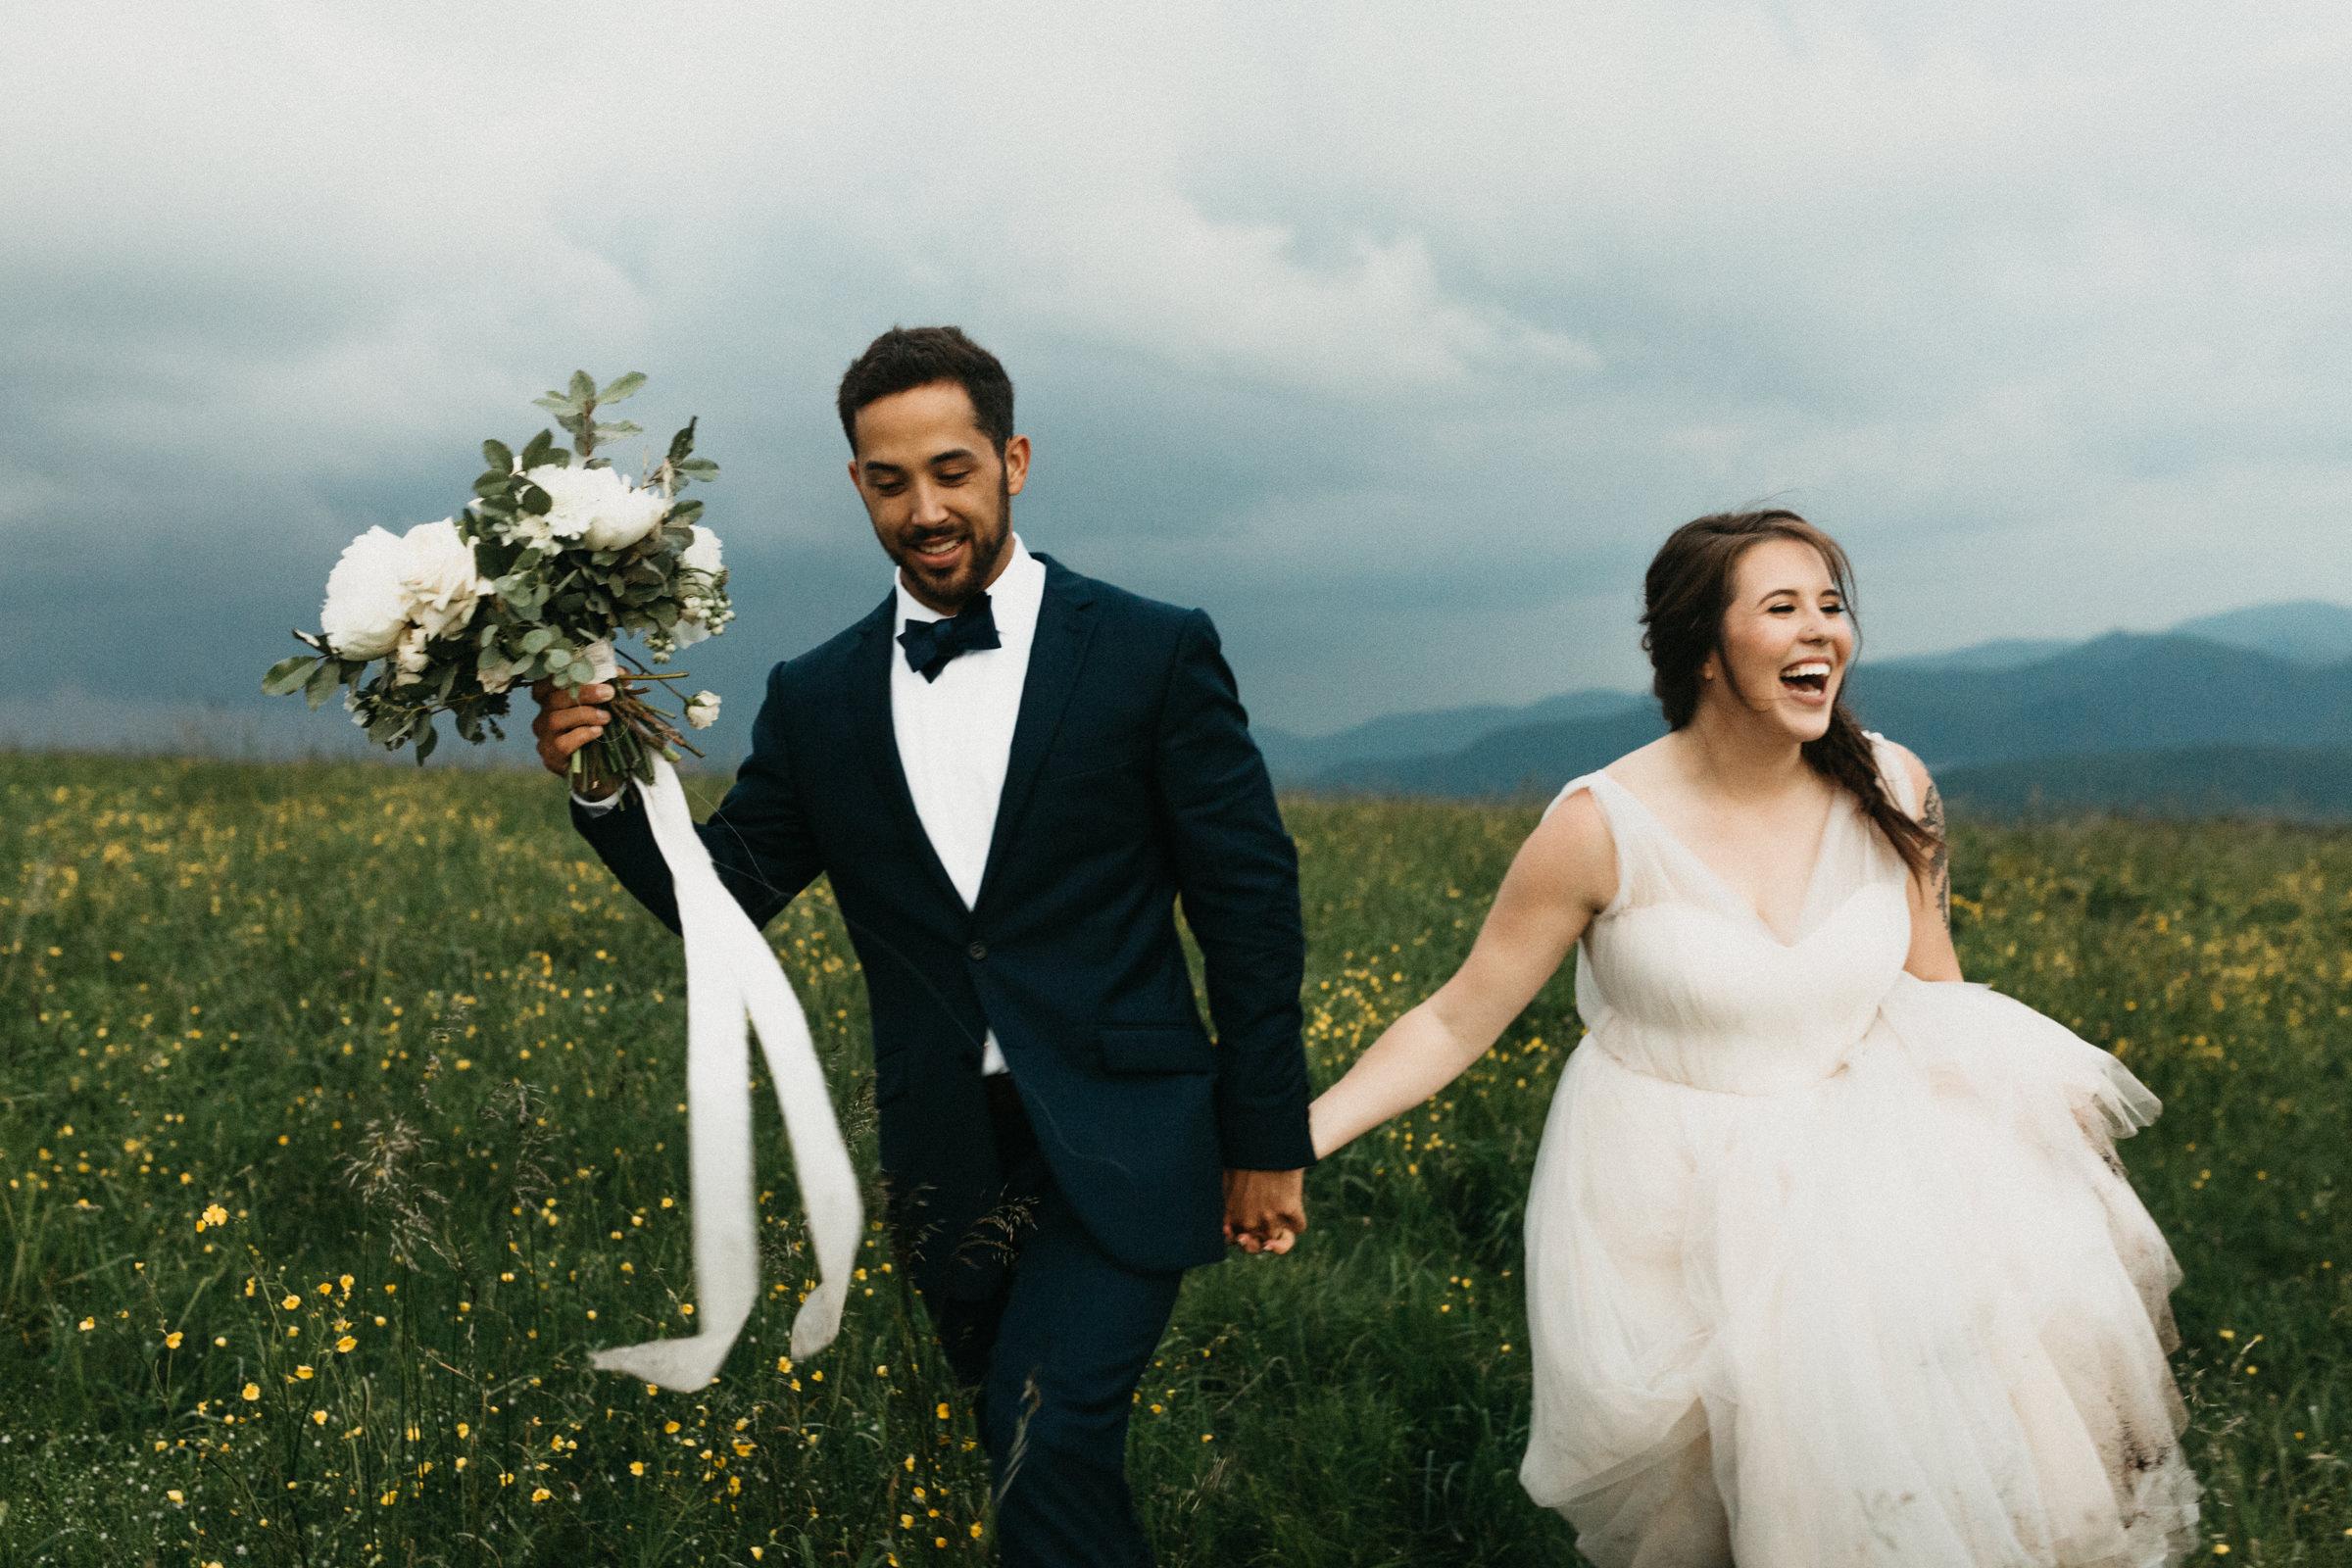 Newlyweds walk through high grass on the Appalachian trail after their wedding.